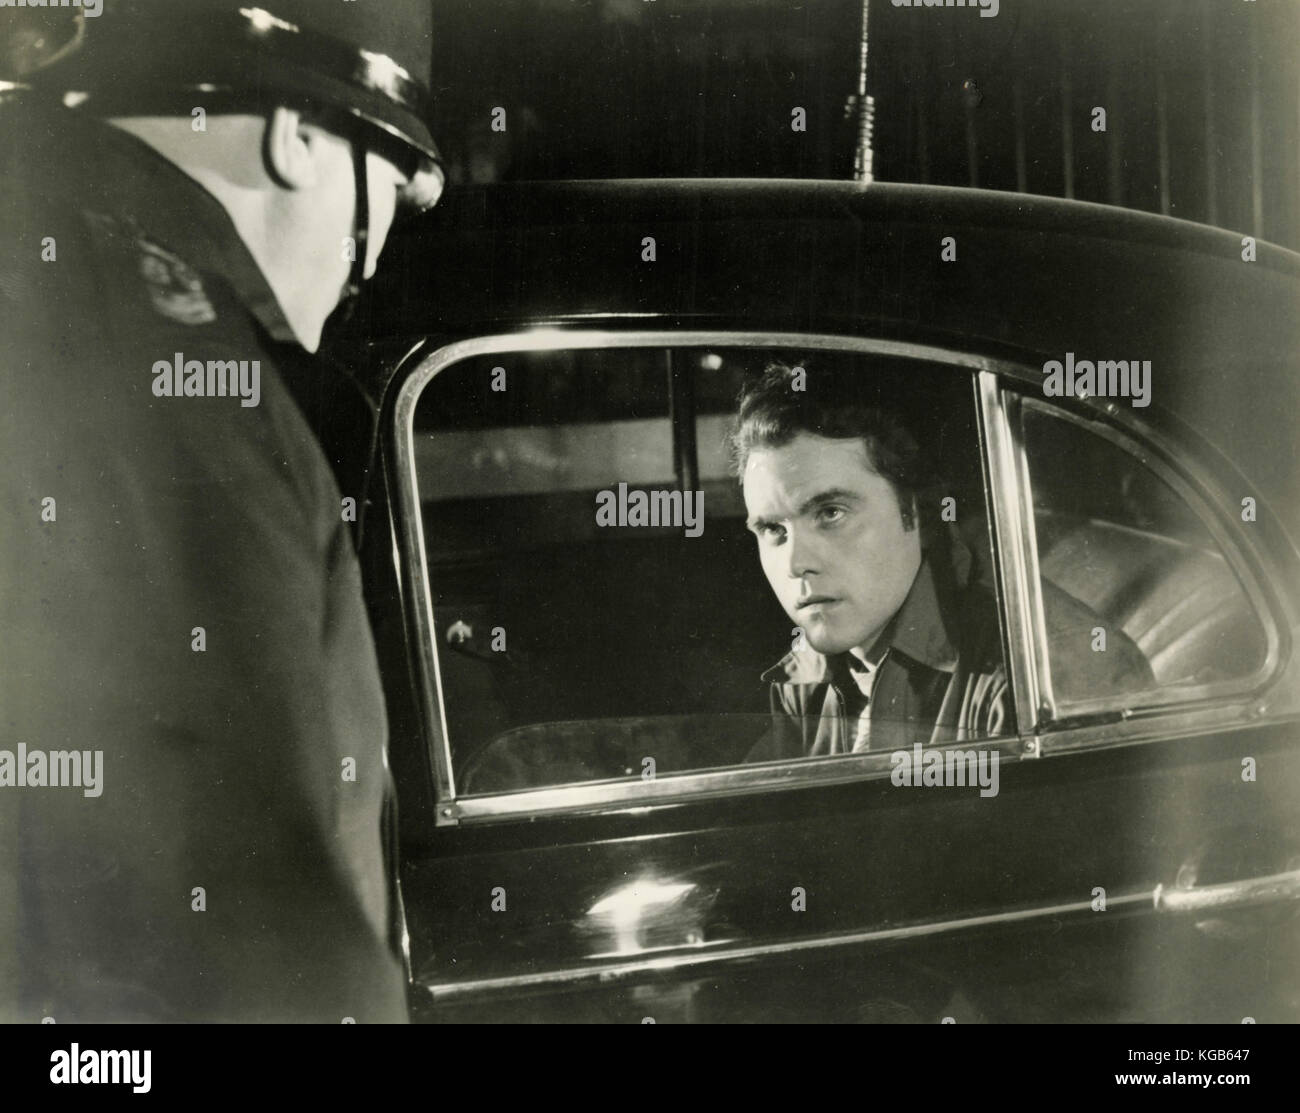 Unidentified movie - Stock Image